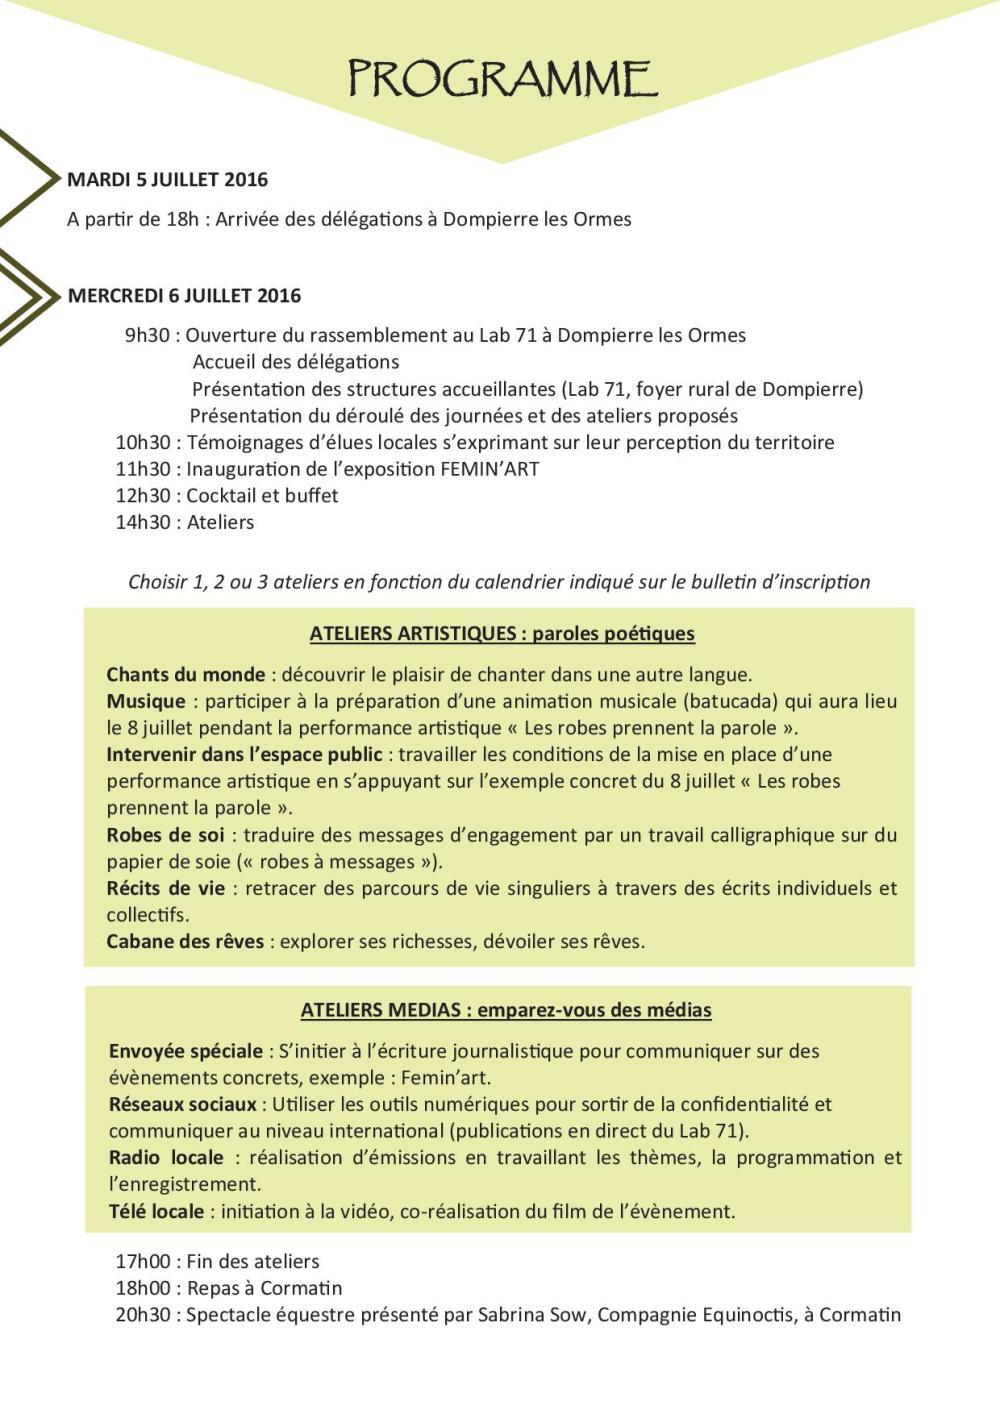 Programme FEMIN'ART3